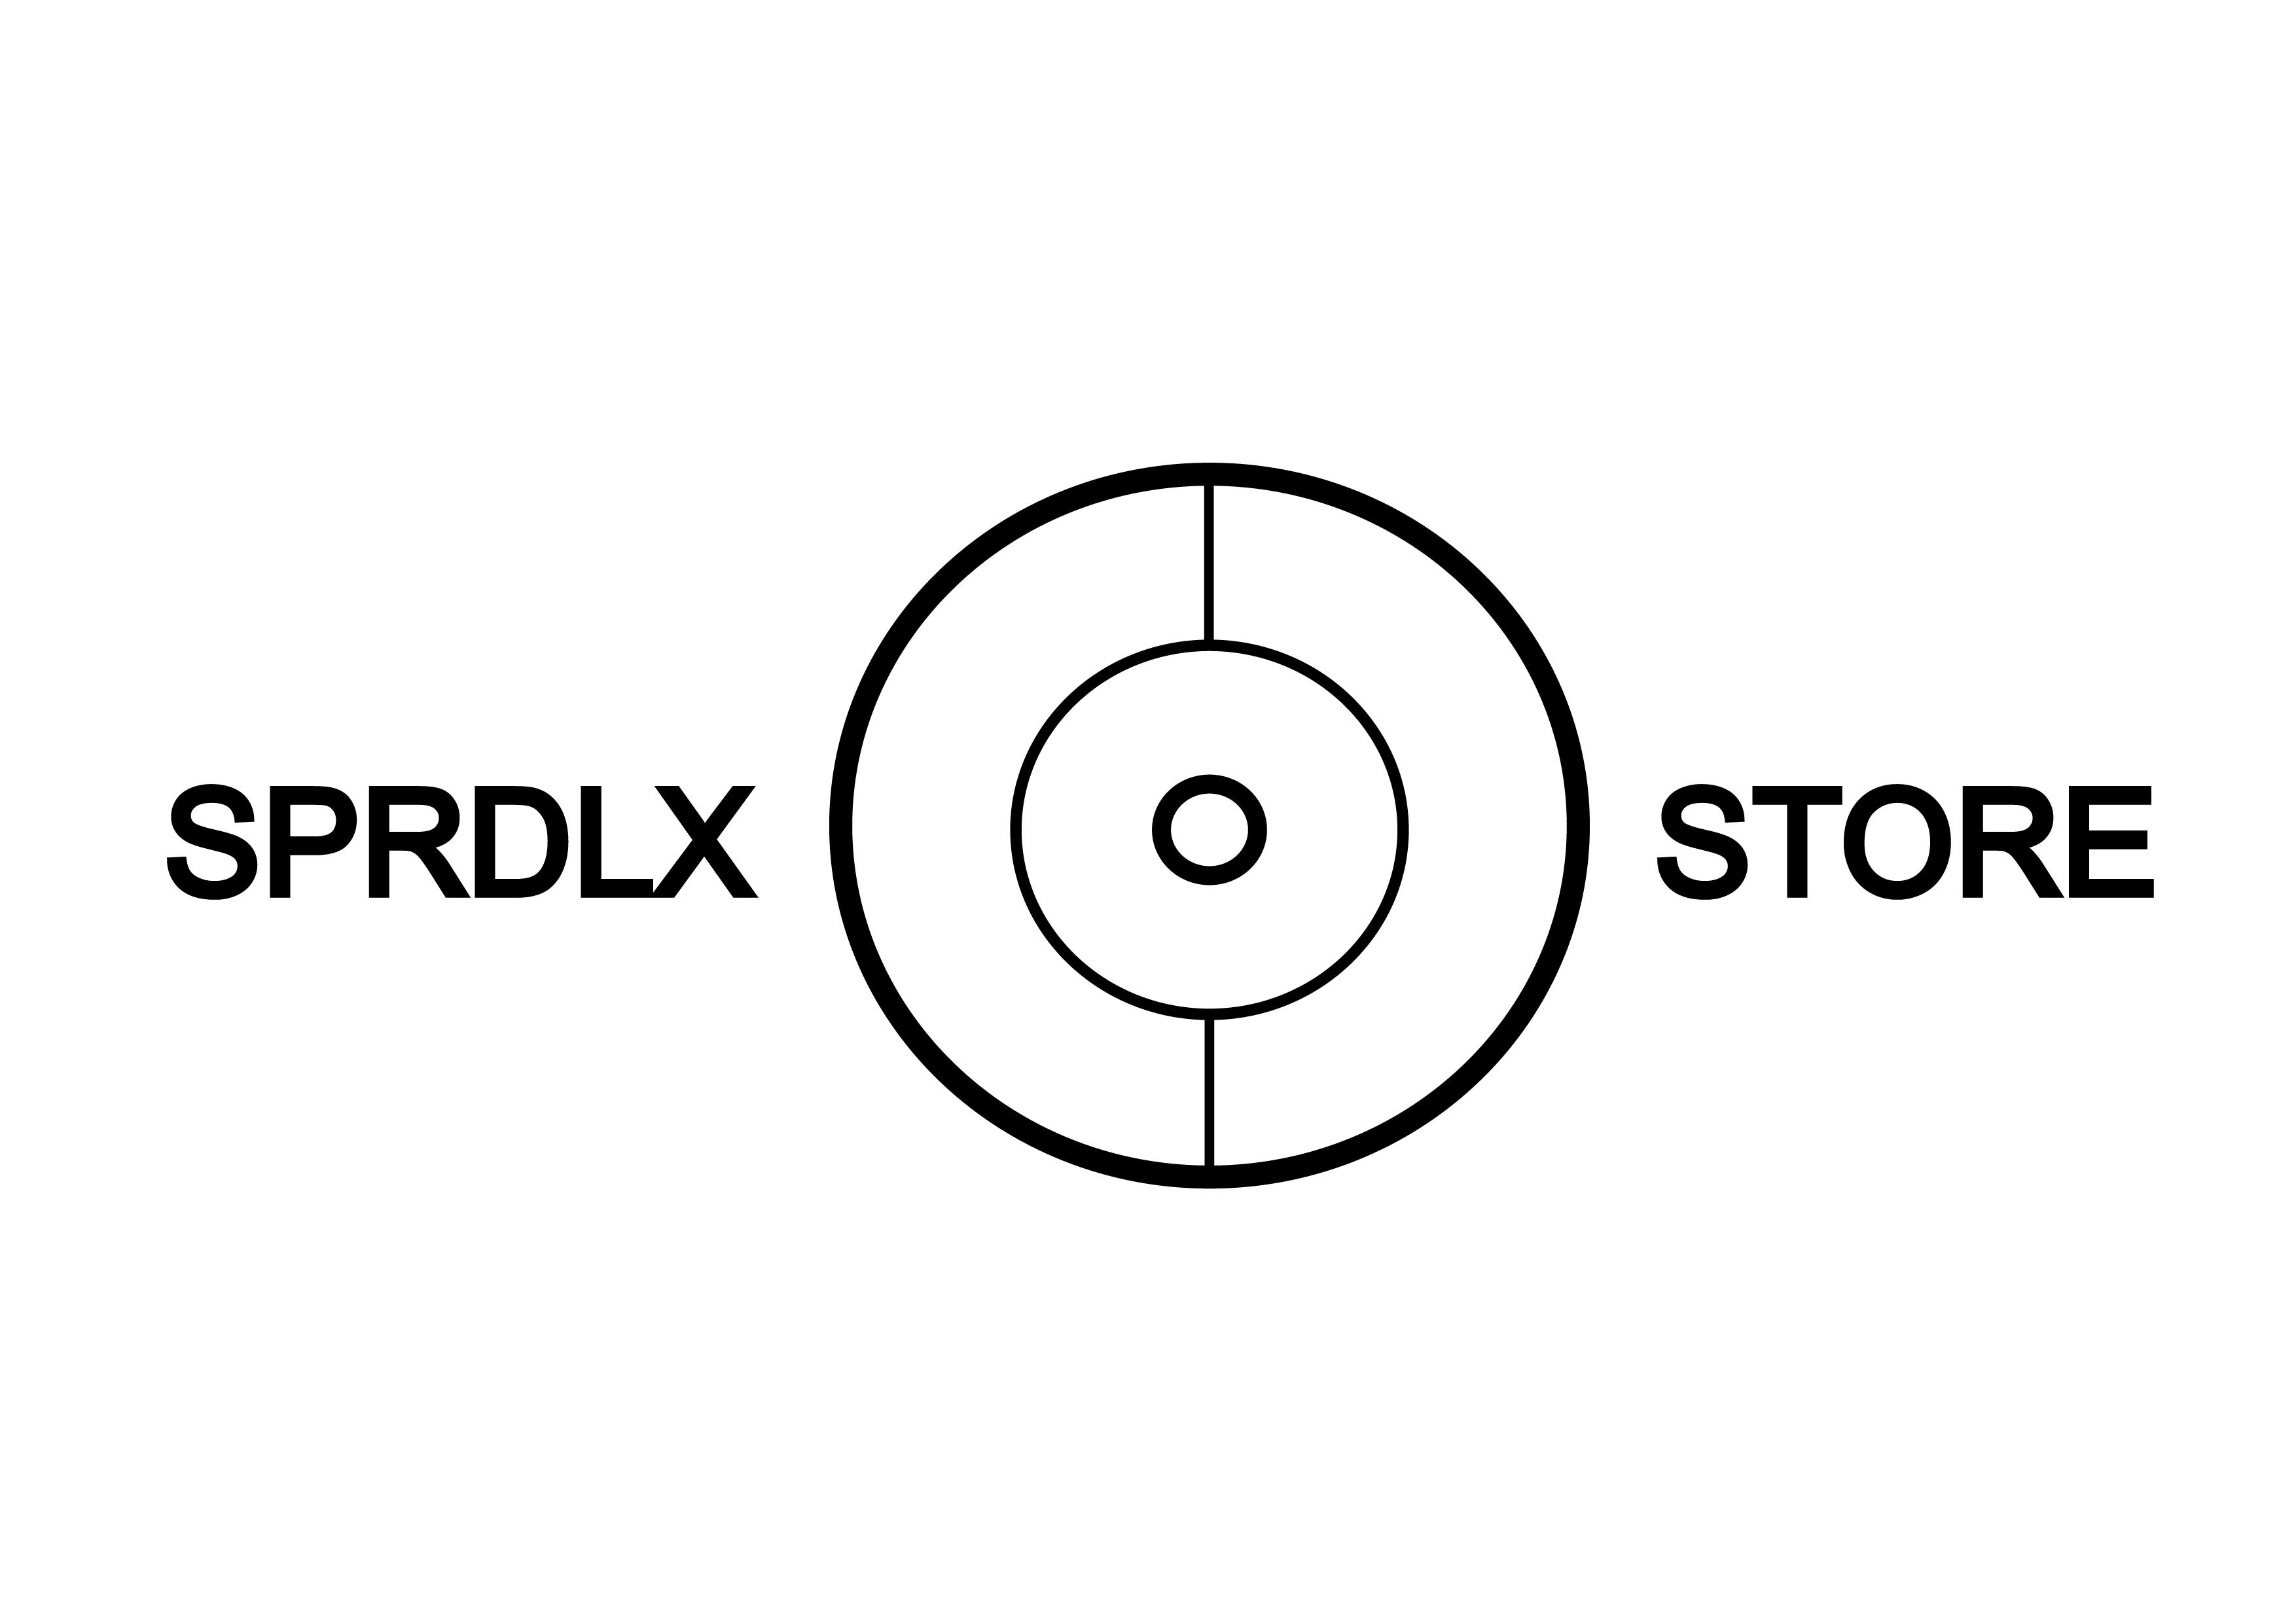 sprdlx store